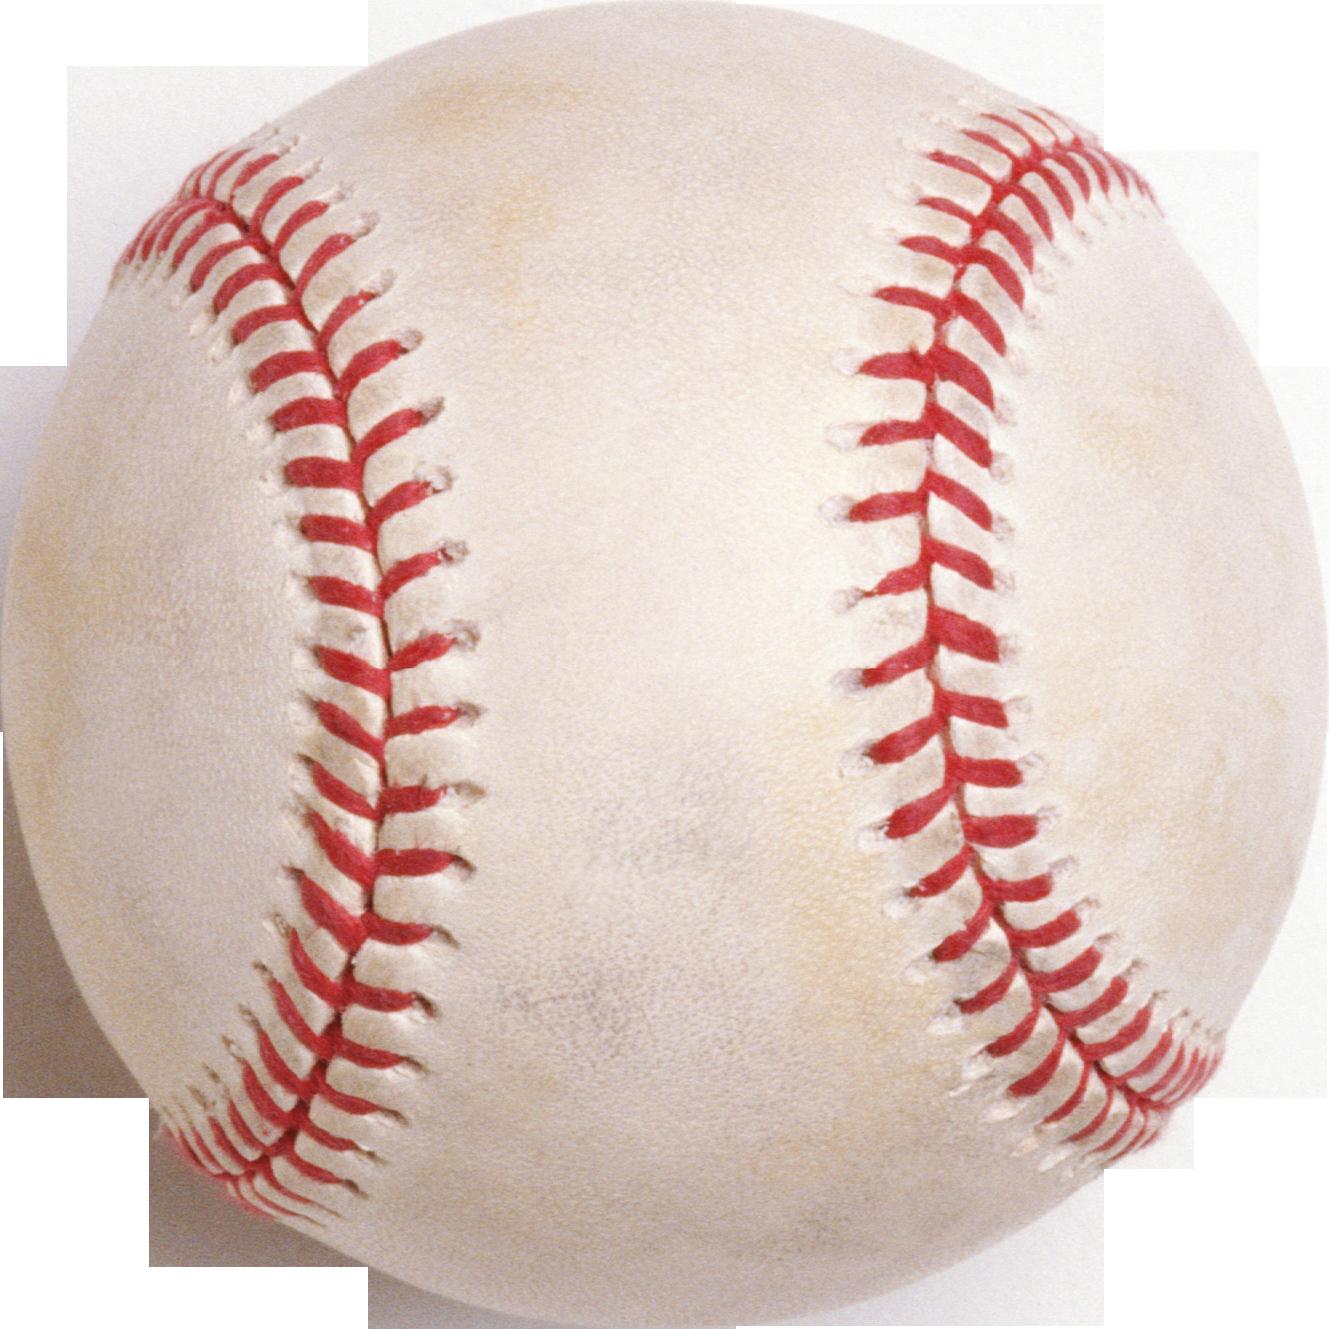 Baseball round clipart jpg stock Baseball ball clipart png 310561 - madmels.info jpg stock